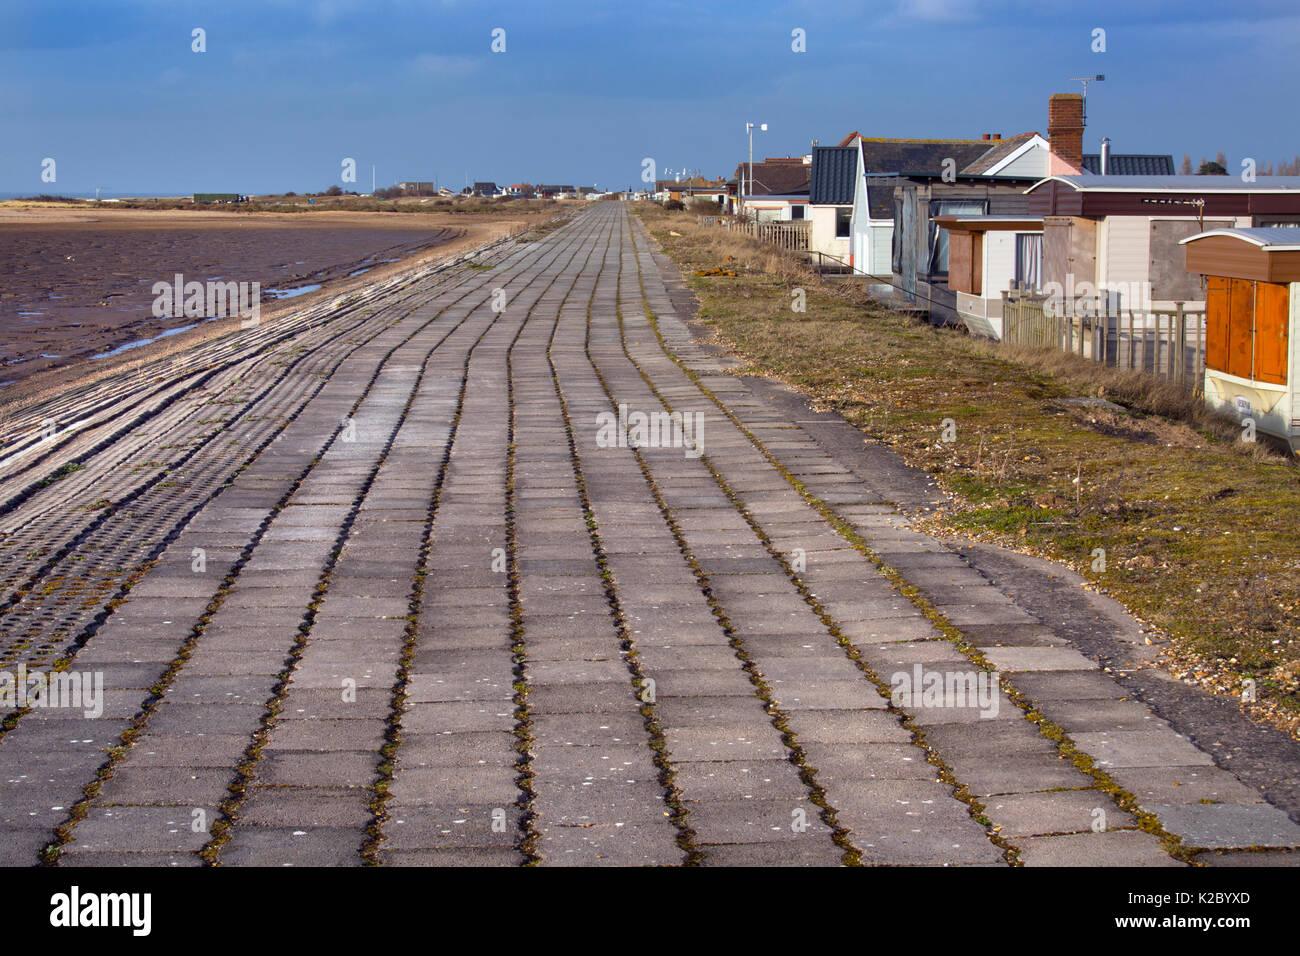 Sea wall and housing vulnerable to flooding around The Wash,  Snettisham, Norfolk, England, UK, February 2015. - Stock Image